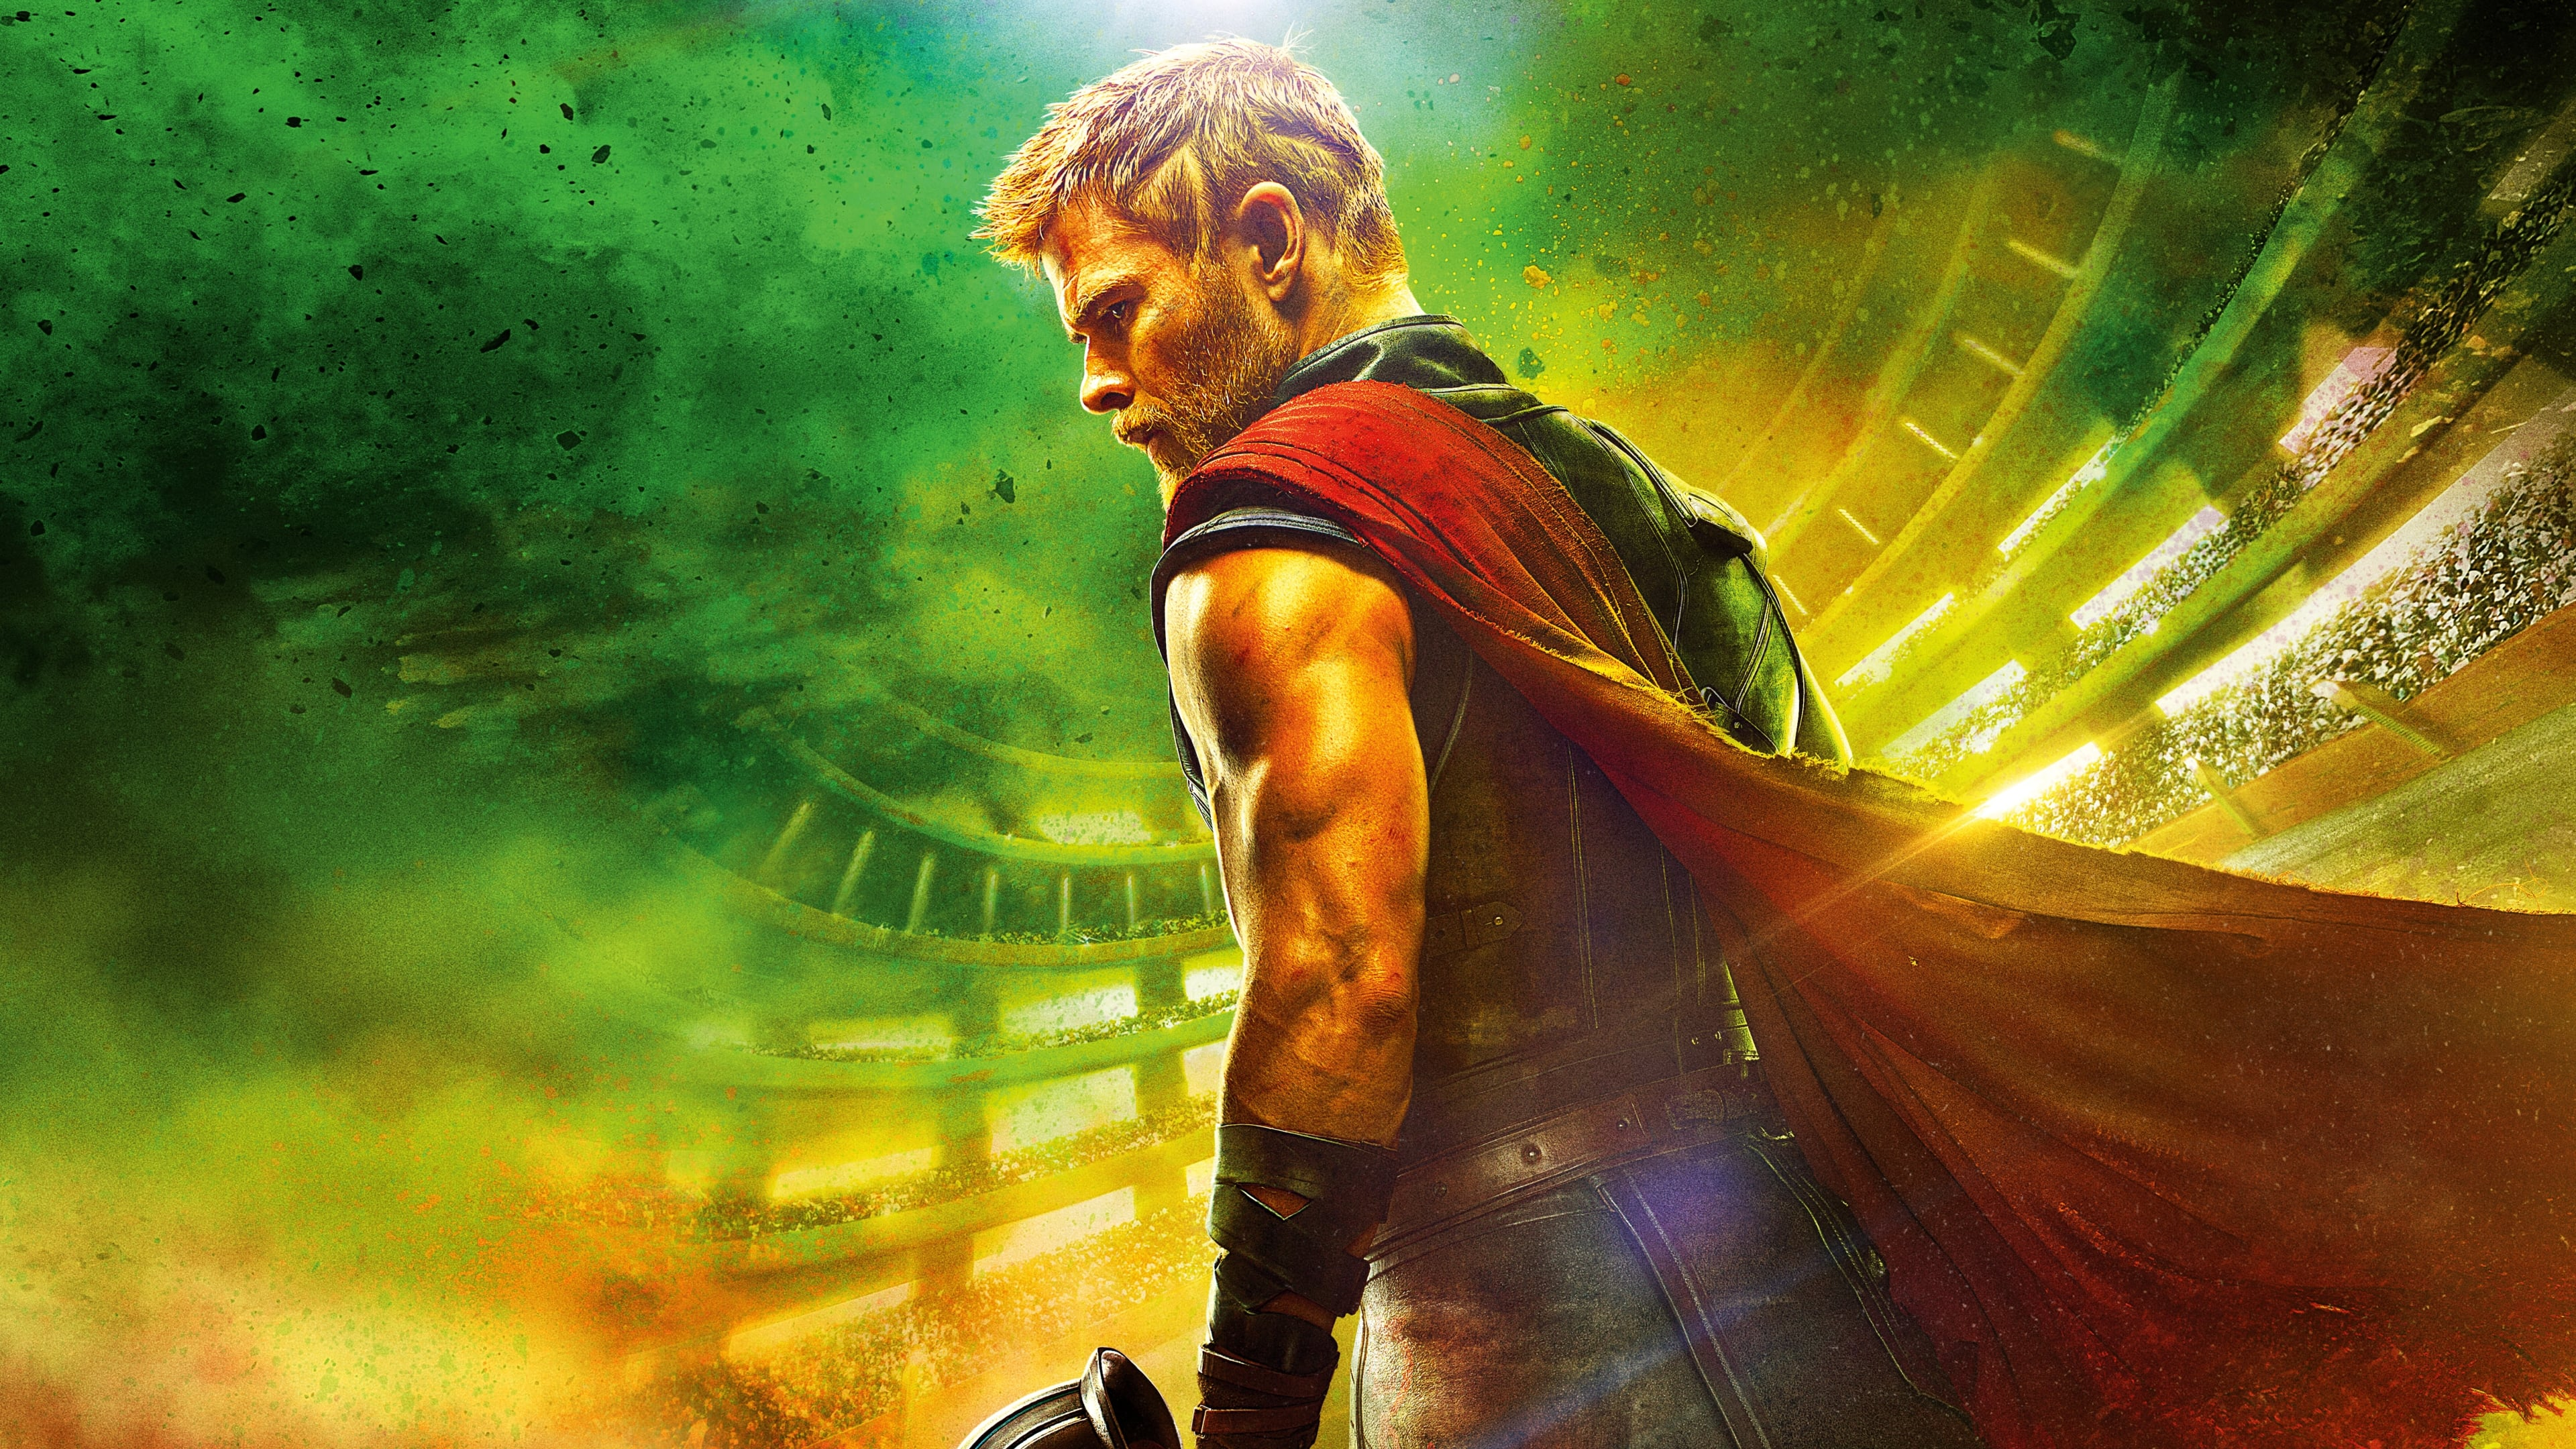 Watch Full Thor: Ragnarok 2017 Movies